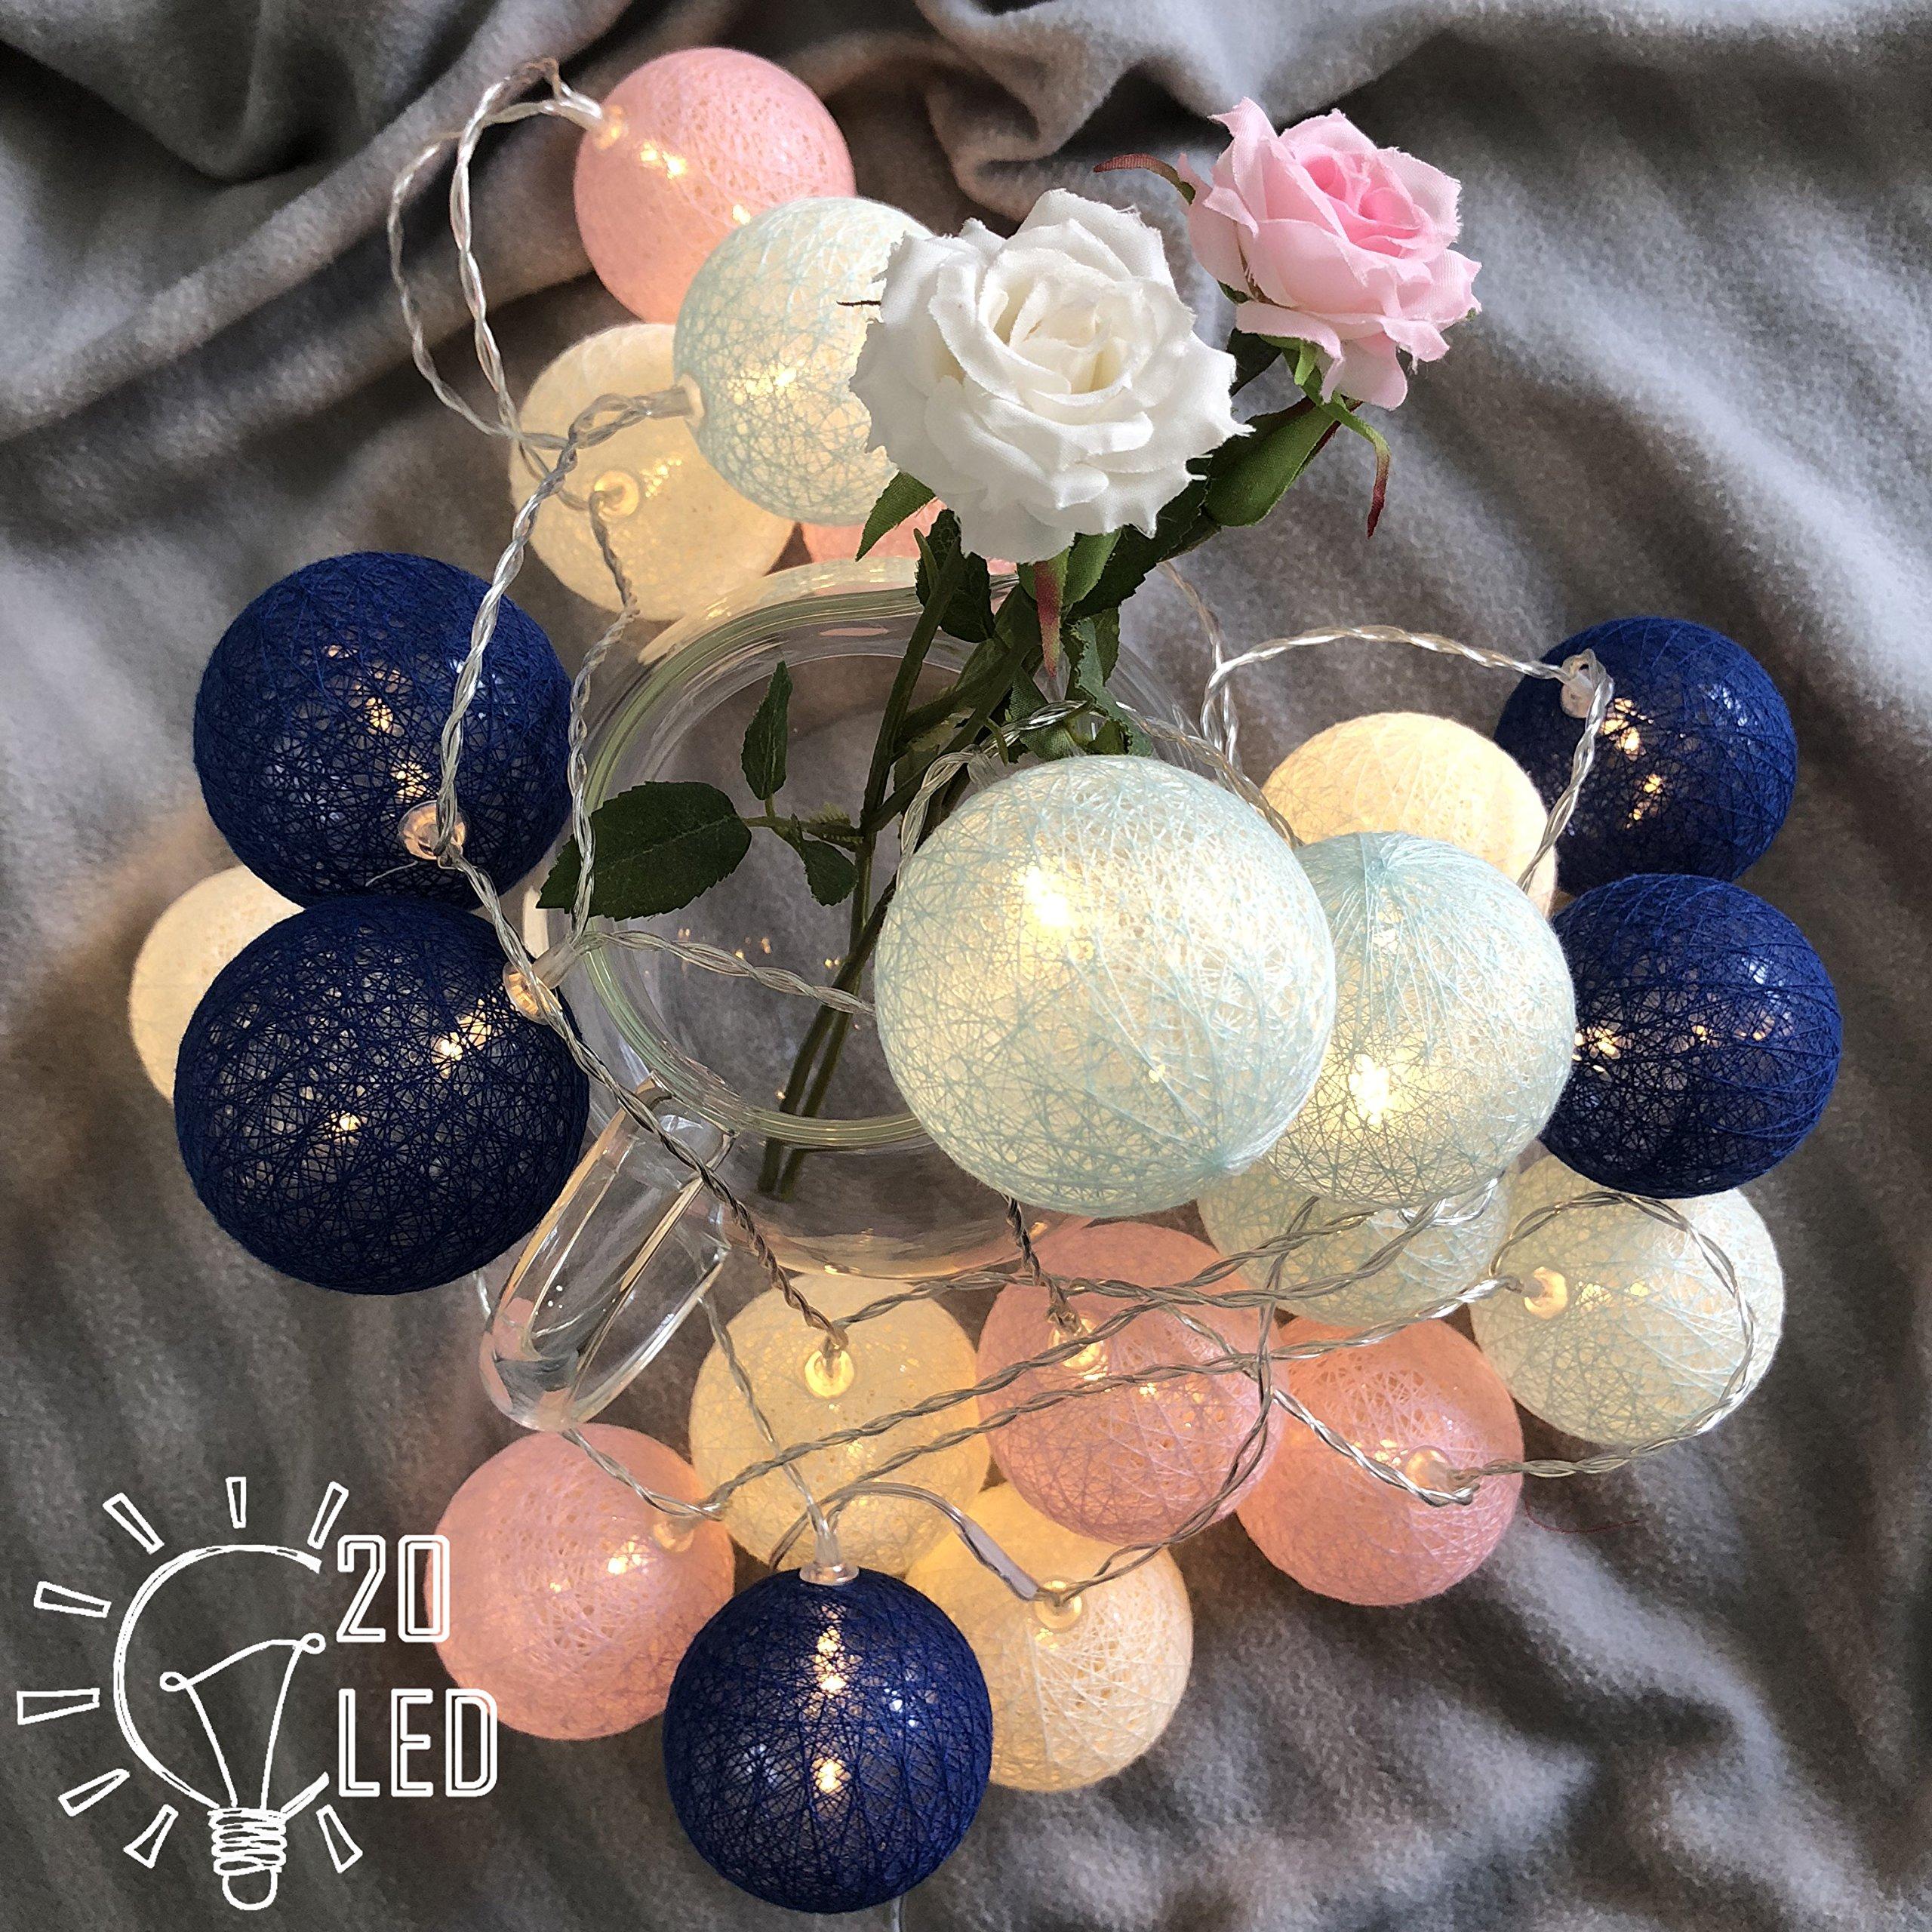 WOZI Cotton Balls String Light 10ft 20 LED, Bedroom and Nursery Cradle Decor Newborn Gift Children's Nightlights Fairy String Light, Wedding Romantic Strip Decor Garden Party Home Strip (3M Battery)